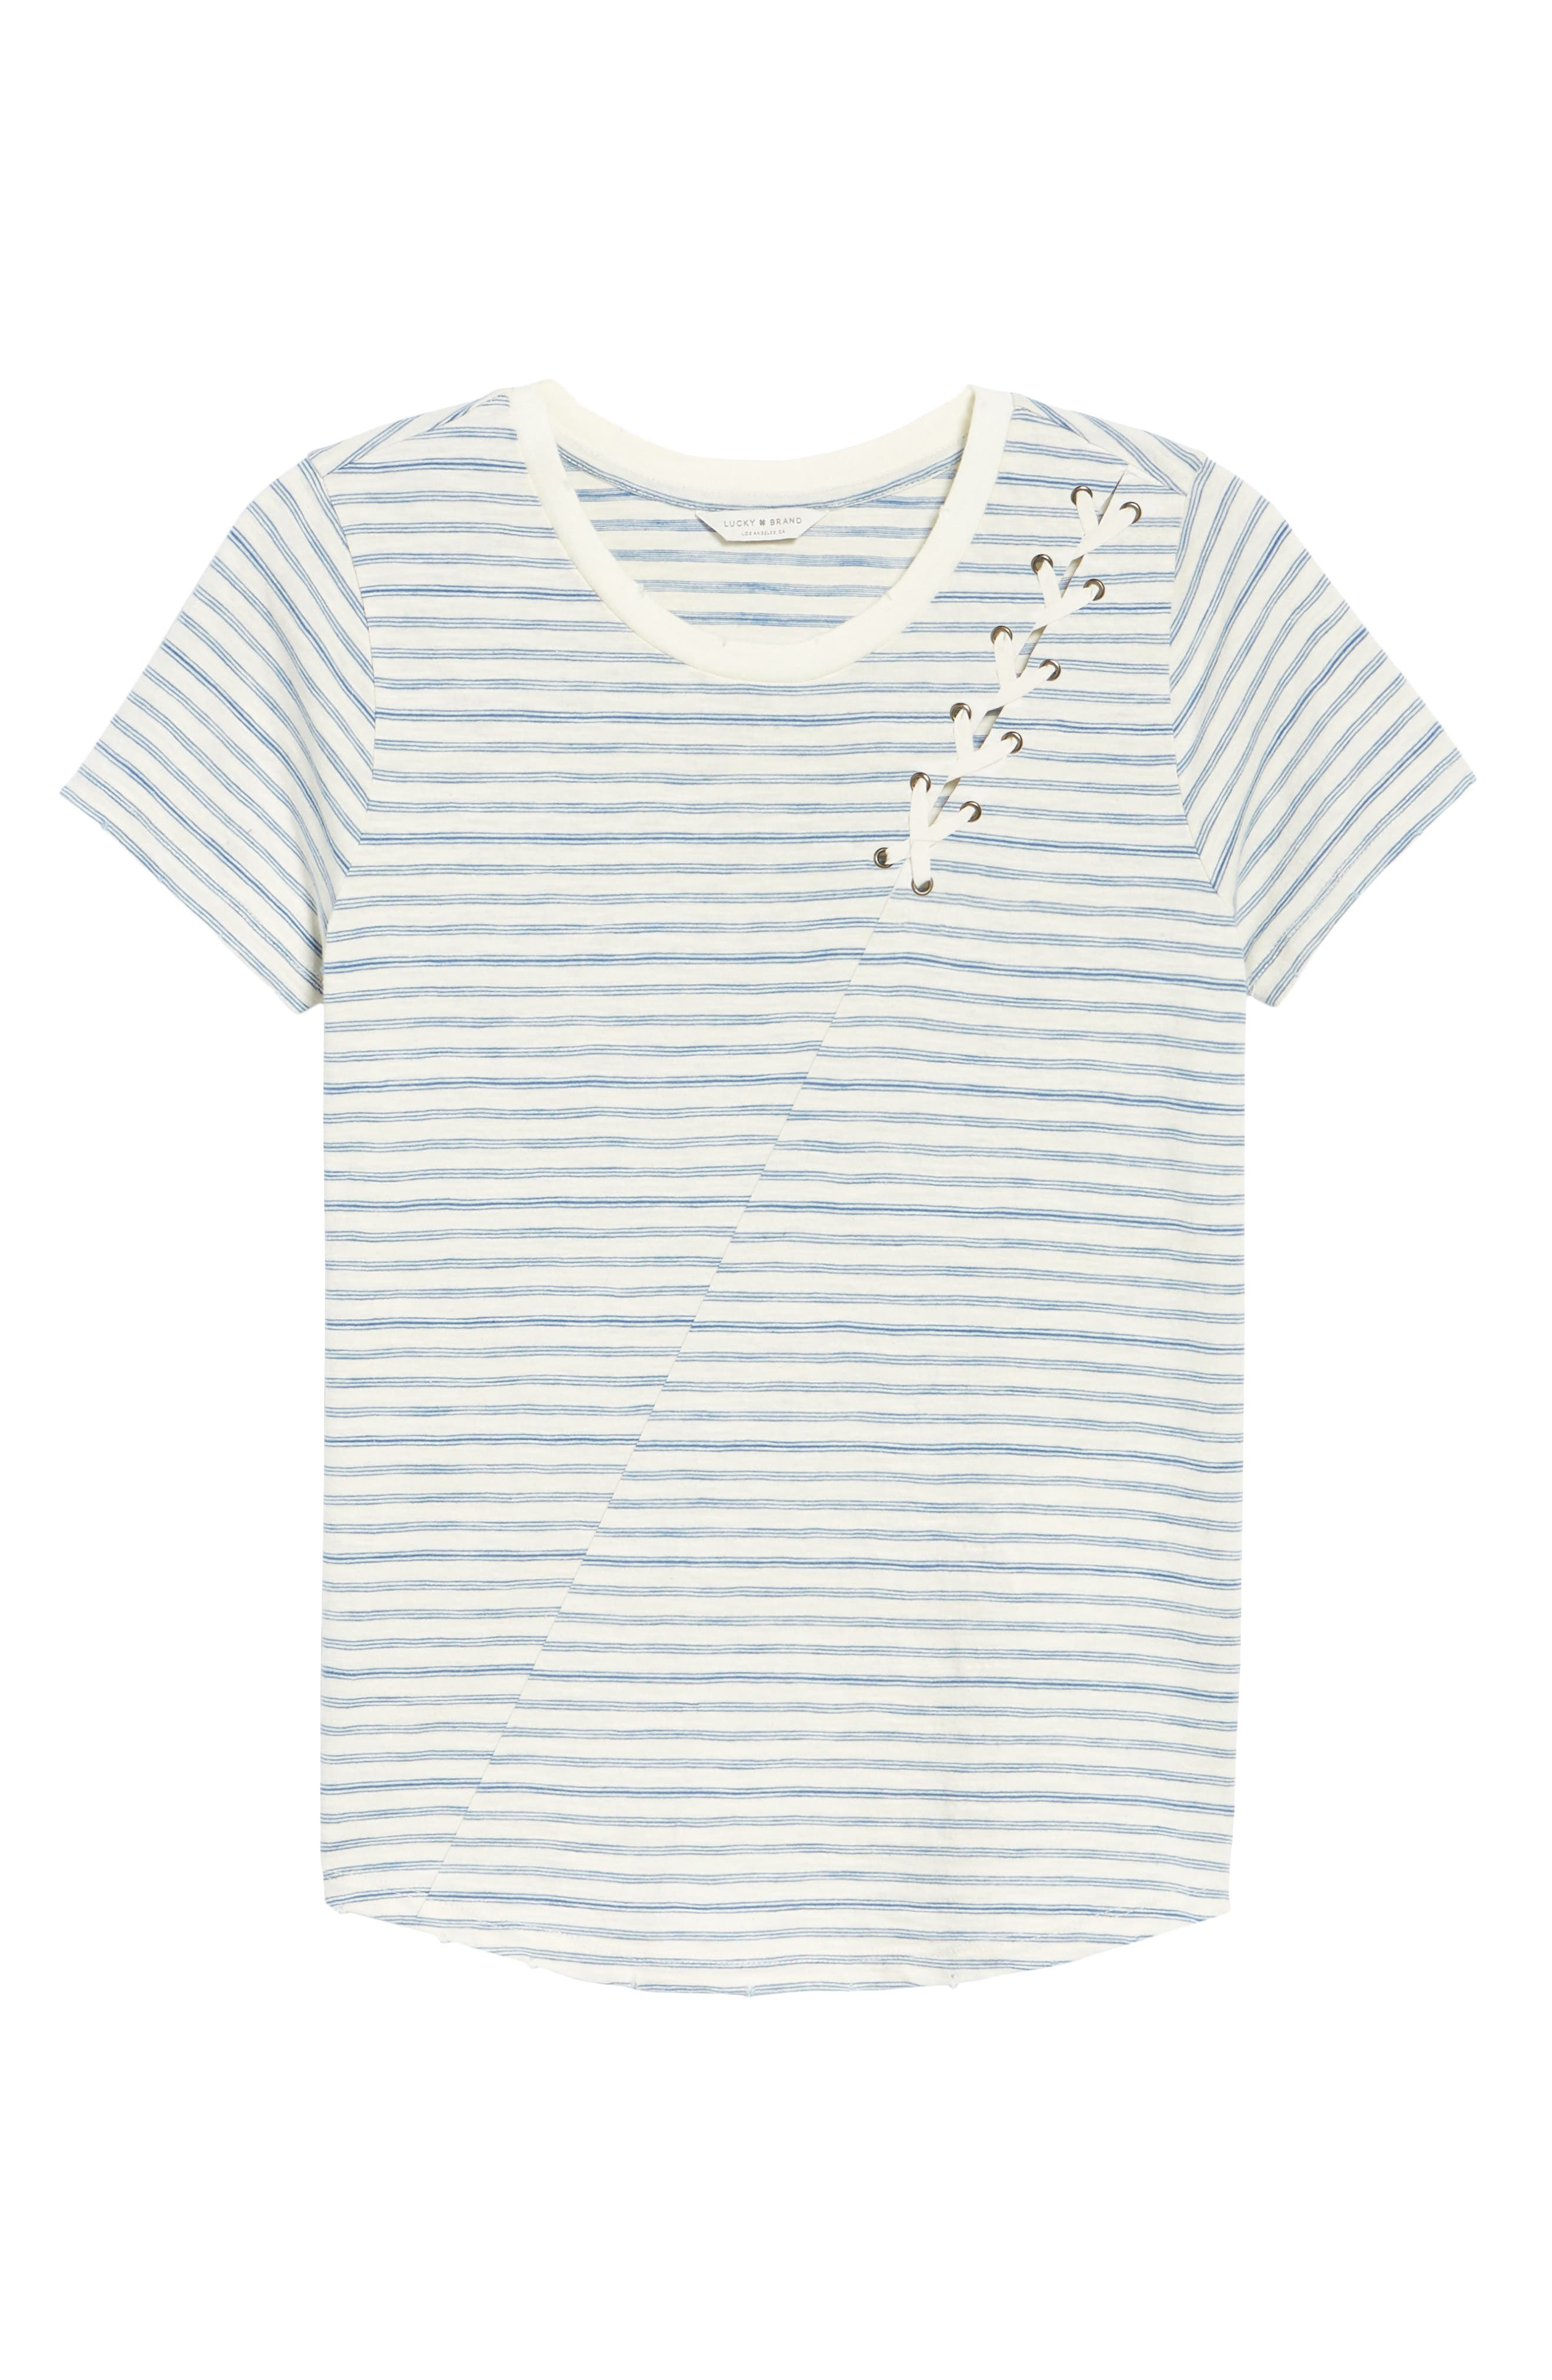 Lace-Up Shoulder Stripe Tee,                             Alternate thumbnail 7, color,                             Blue Multi